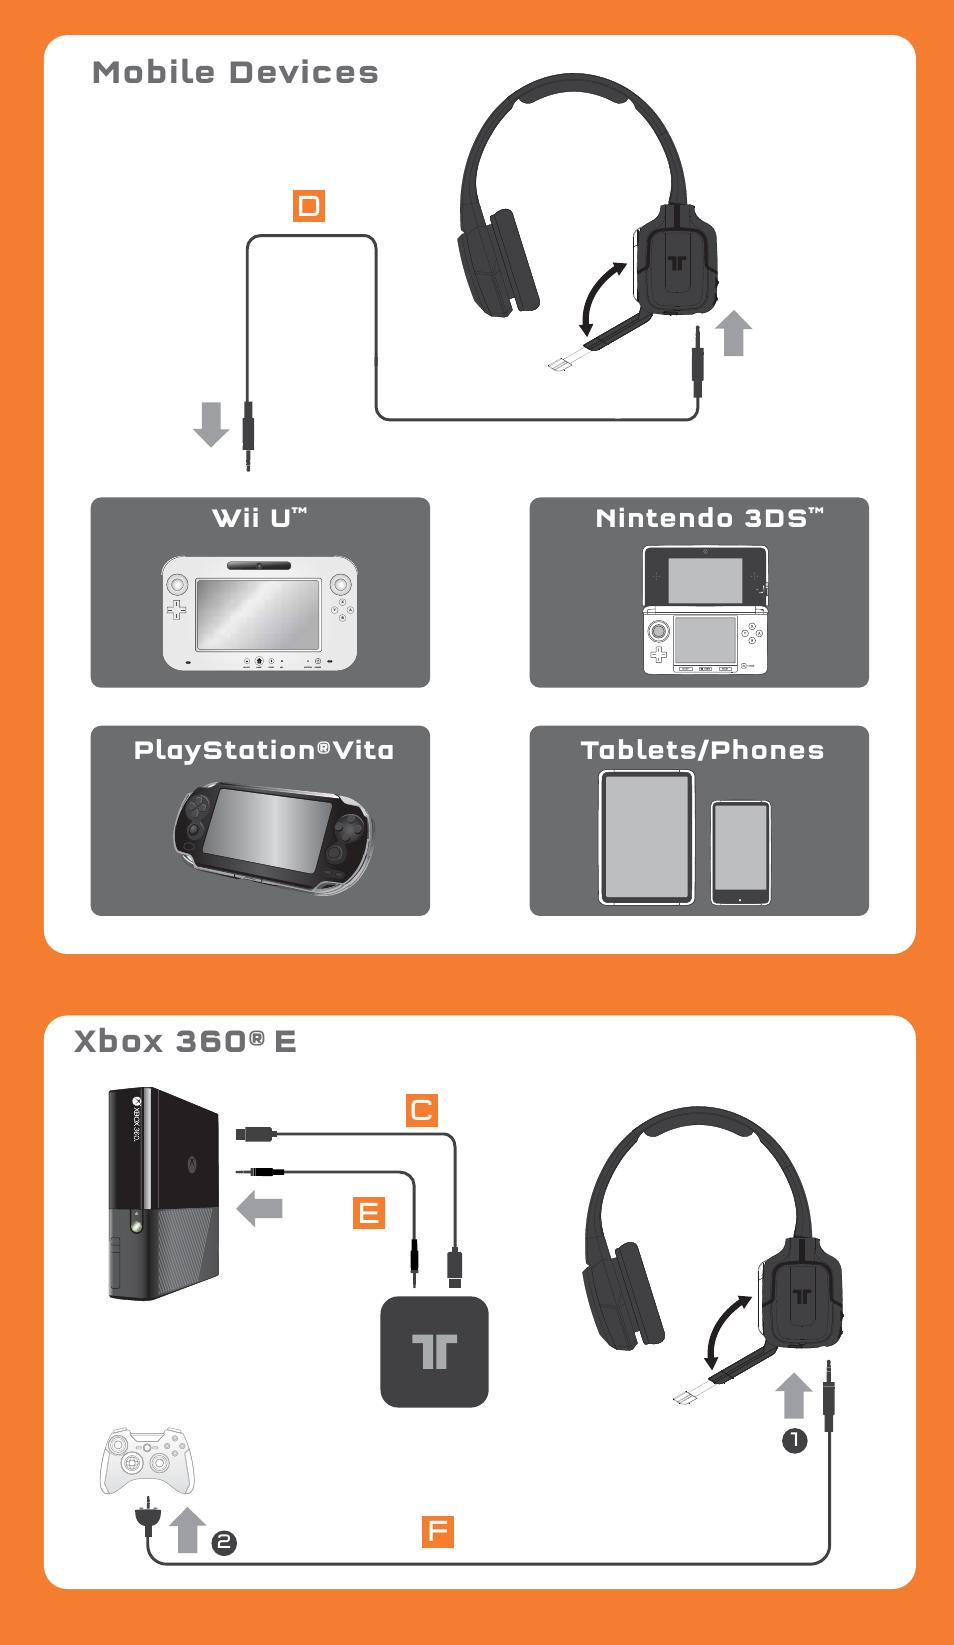 Mobile devices, Xbox 360® e, Cd e f | TRITTON Kunai Wireless Stereo Headset  User Manual | Page 3 / 8